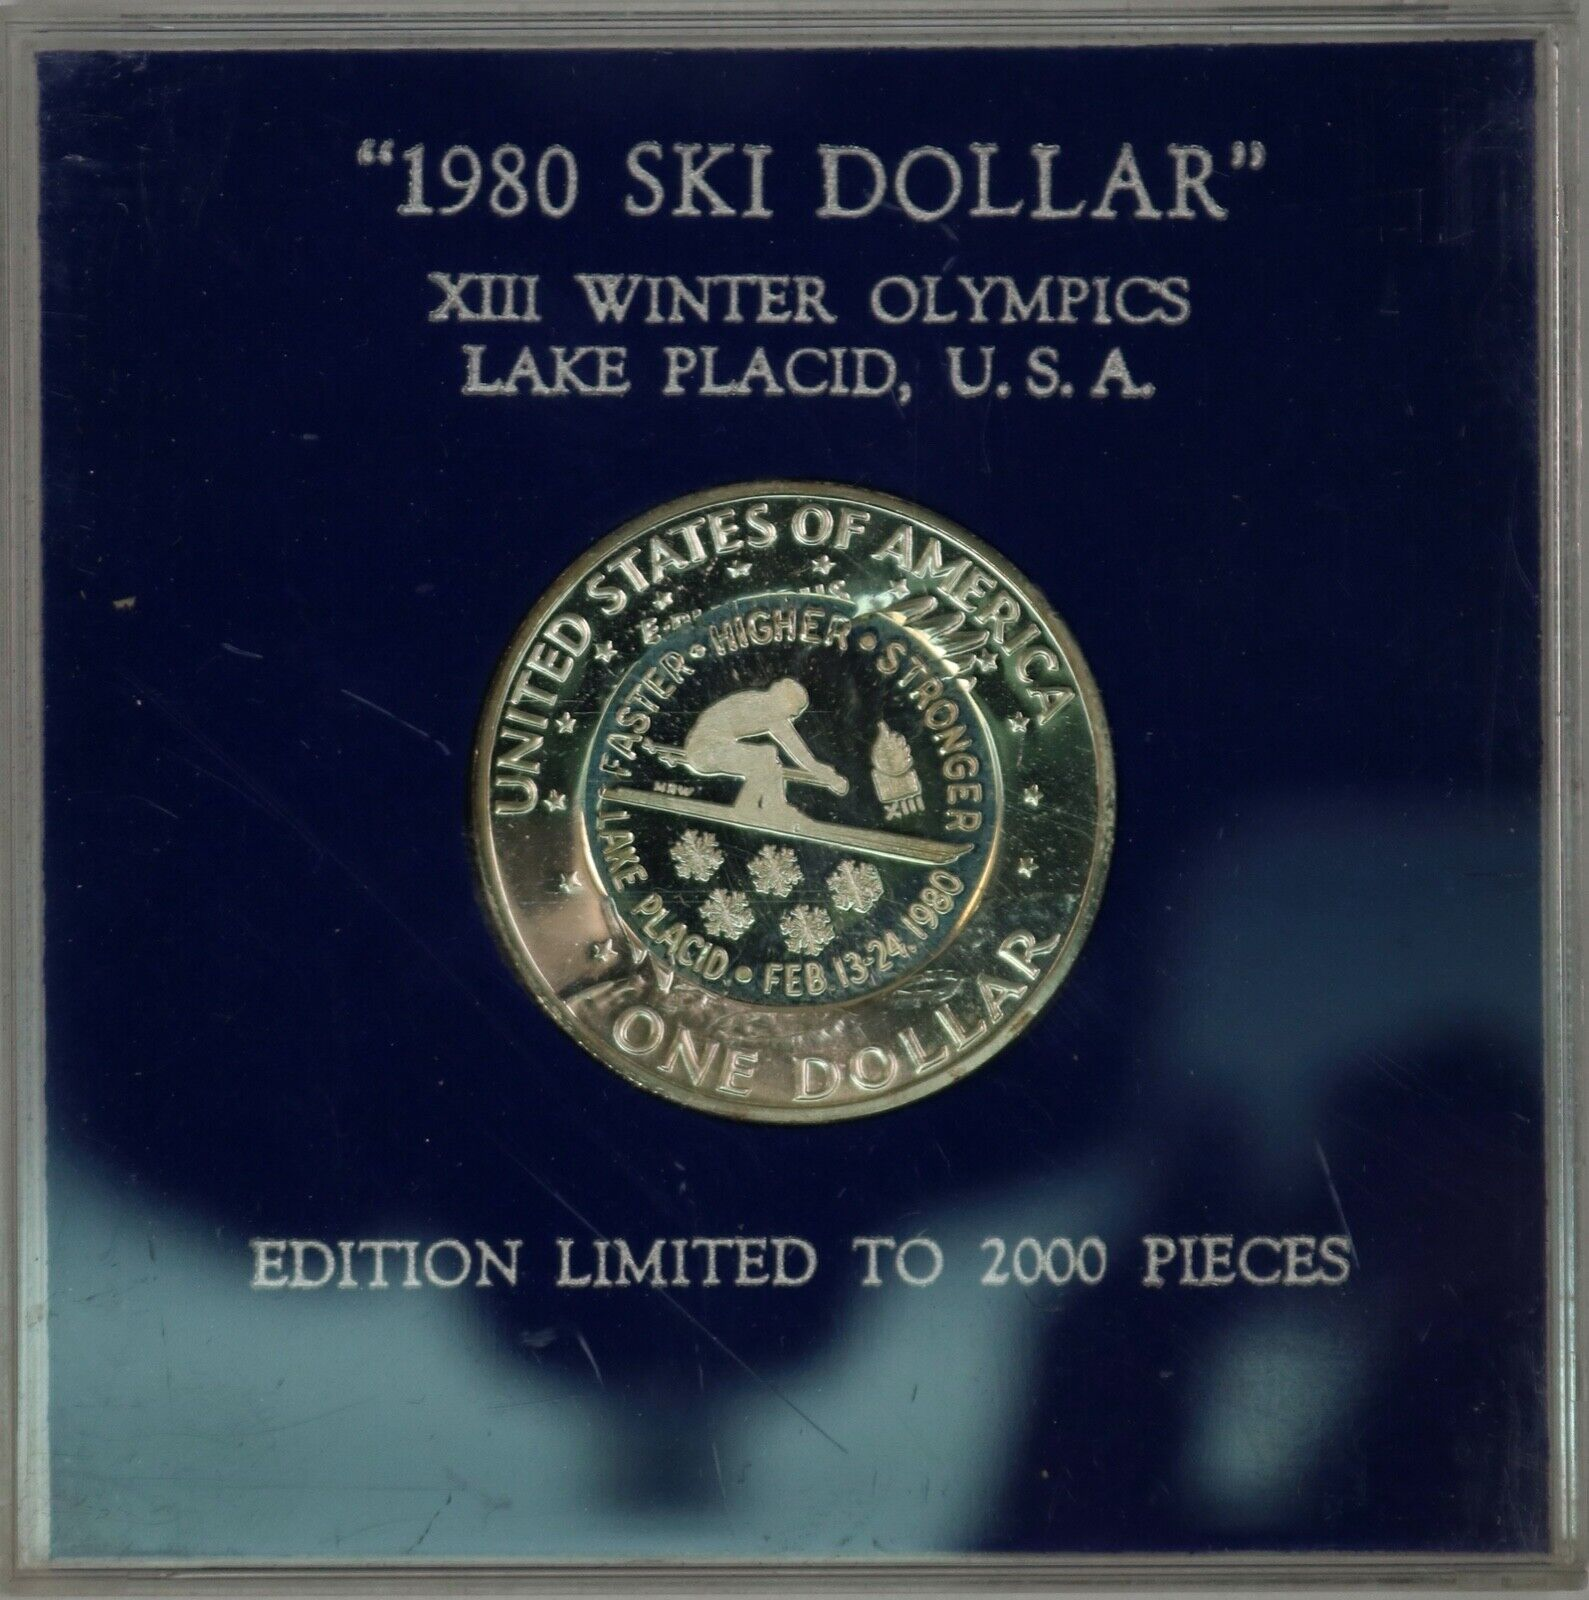 1980 Ski Dollar. Counterstrike By Mel Wacks. RAW558/SH - $59.99